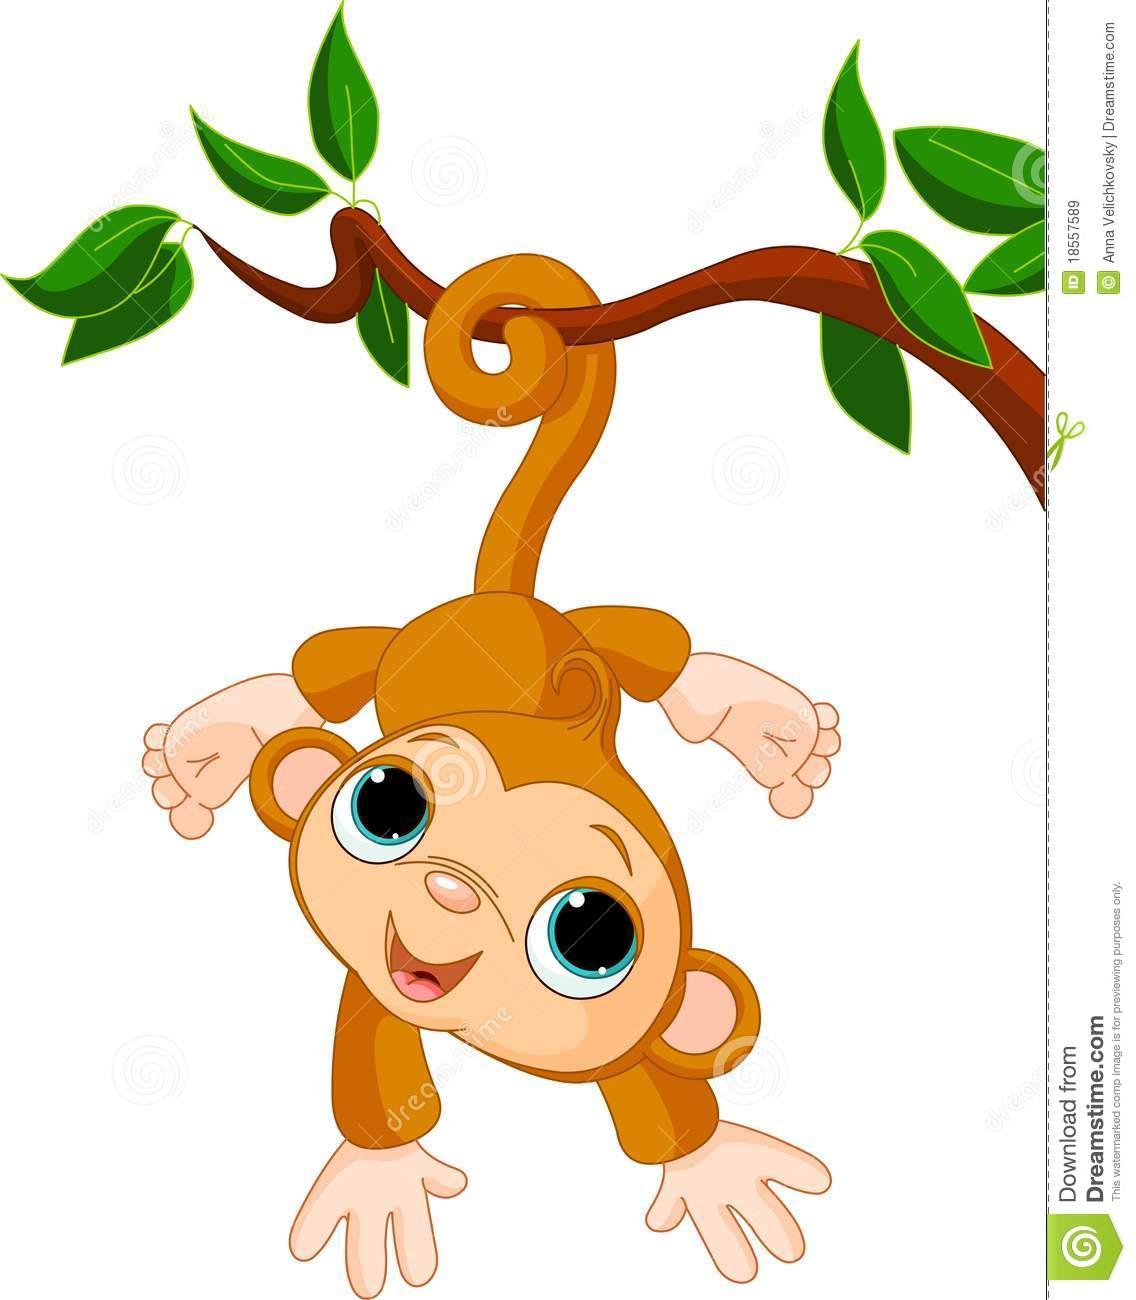 baby monkey clip art - photo #4